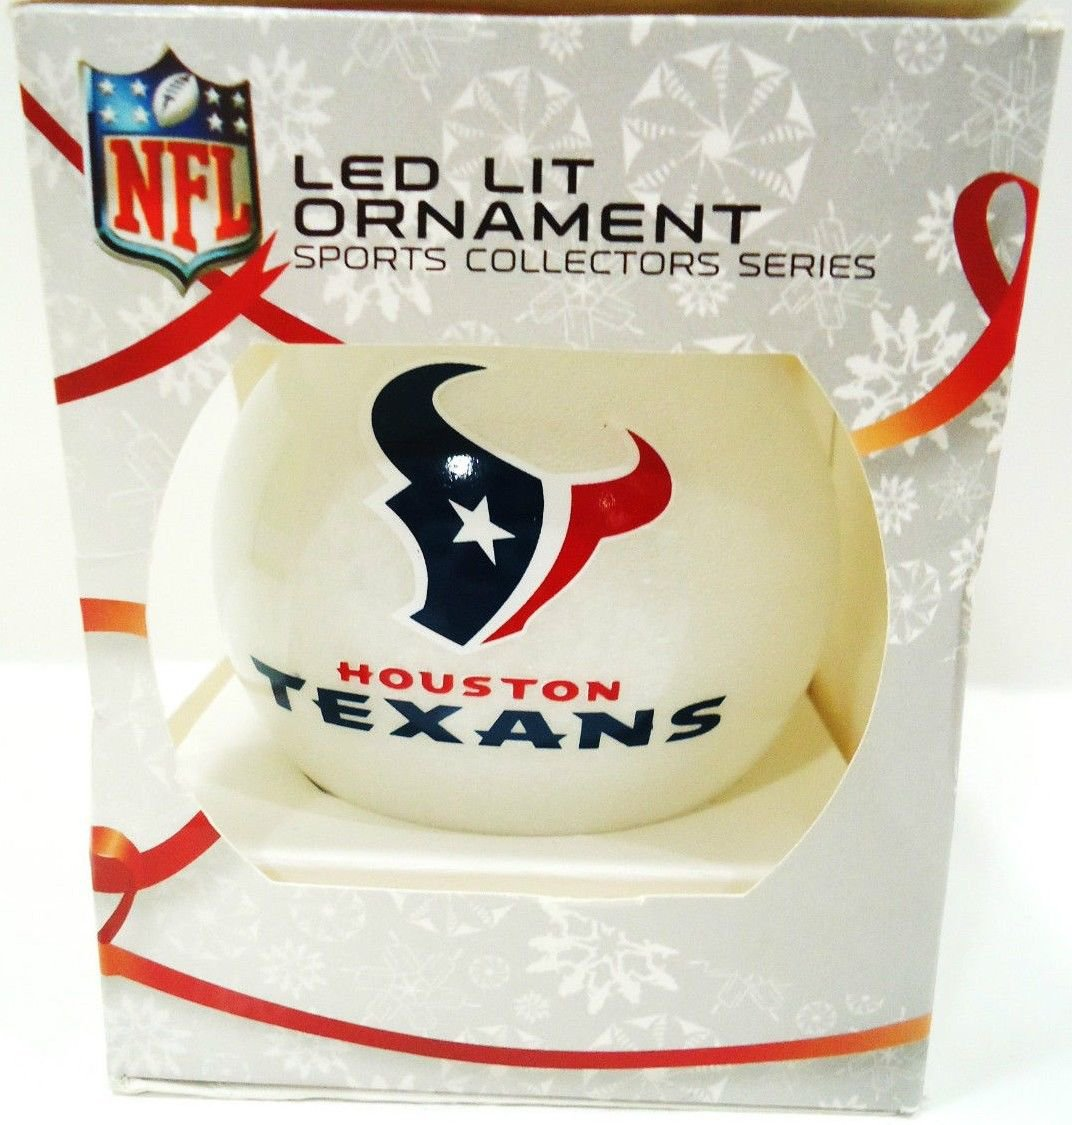 NFL - HOUSTON - TEXANS - COLOR - CHRISTMAS - LED - FOOTBALL - ORNAMENT - NEW